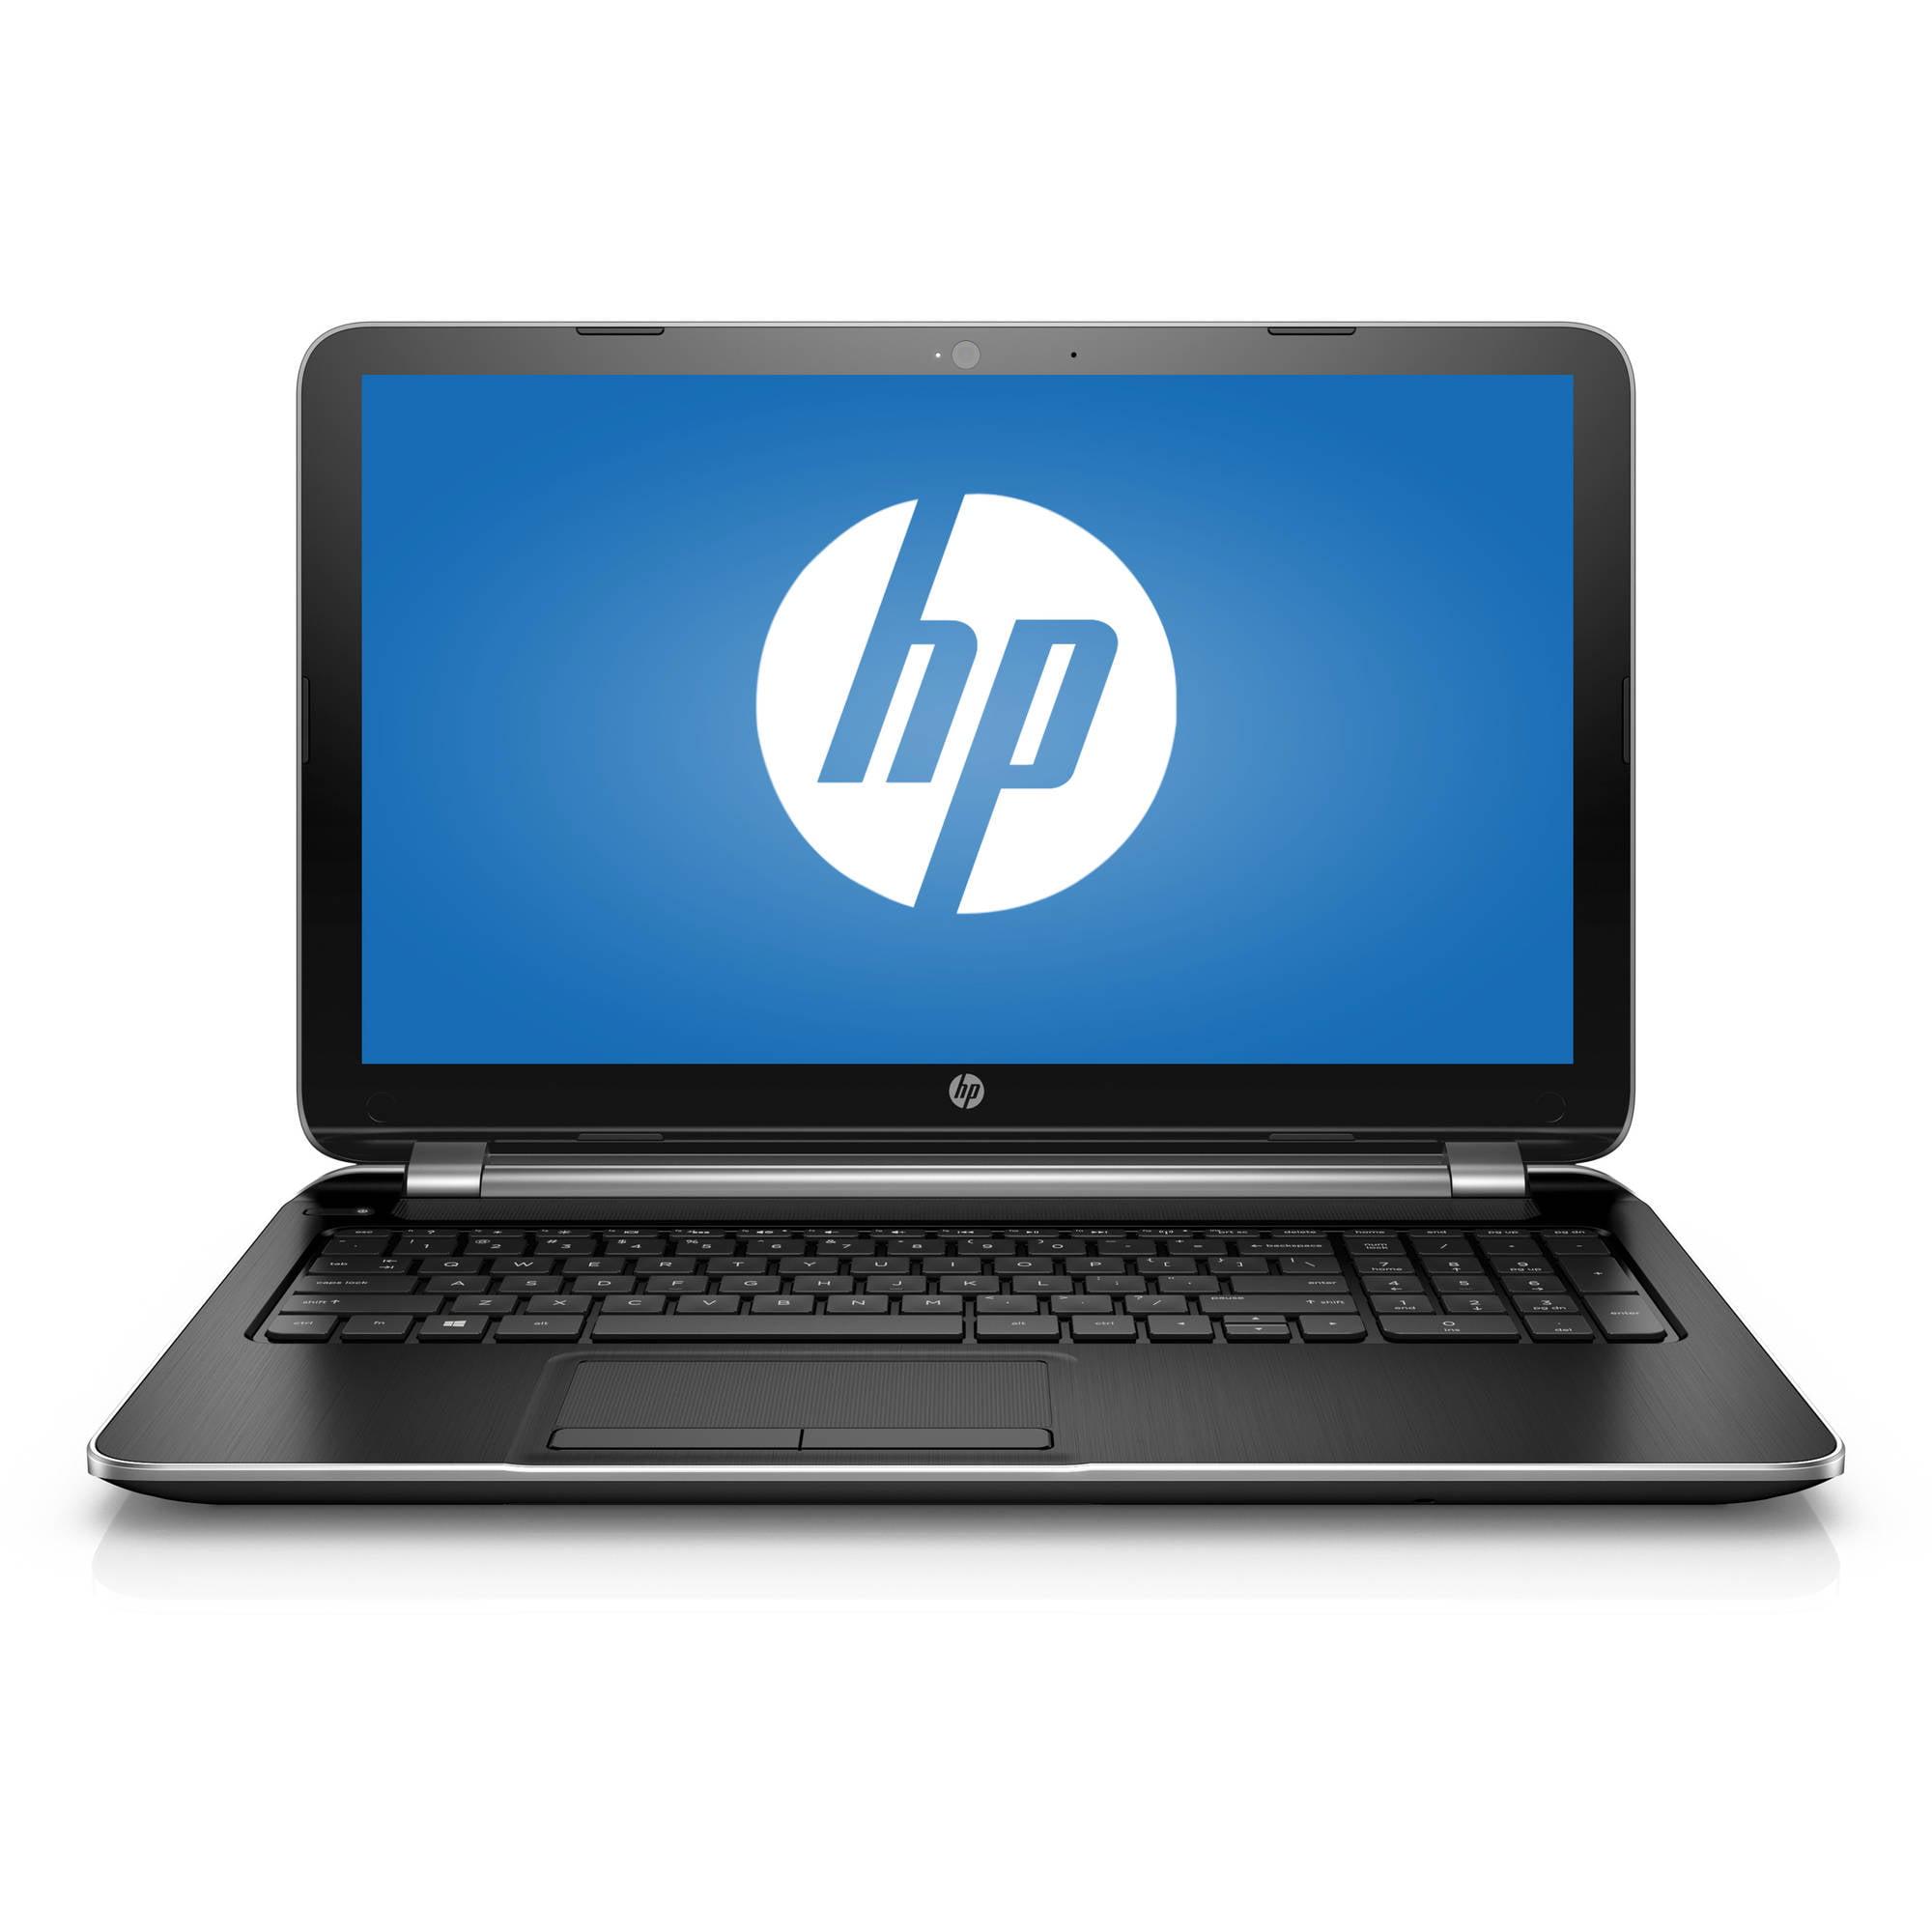 "Refurbished HP Silver 15.6"" 15-f271wm Laptop PC with Intel Pentium N3540 Quad-Core Processor, 4GB Memory, 500GB Hard Drive and Windows 10 Home"